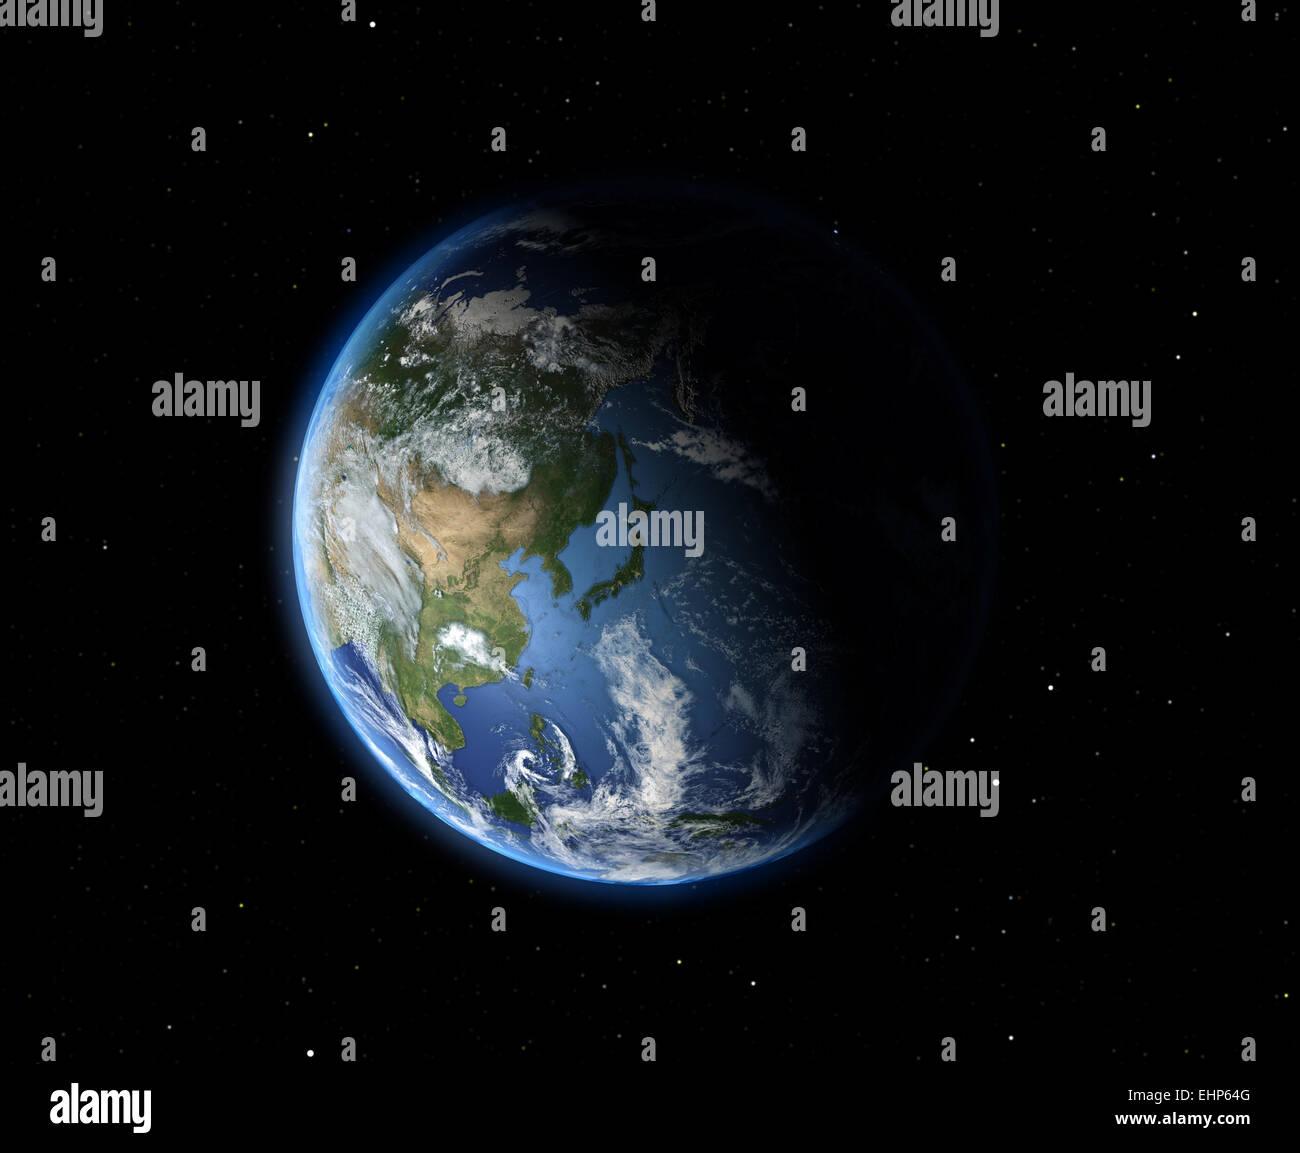 Die Erde aus dem Weltraum. Asien Stockfoto